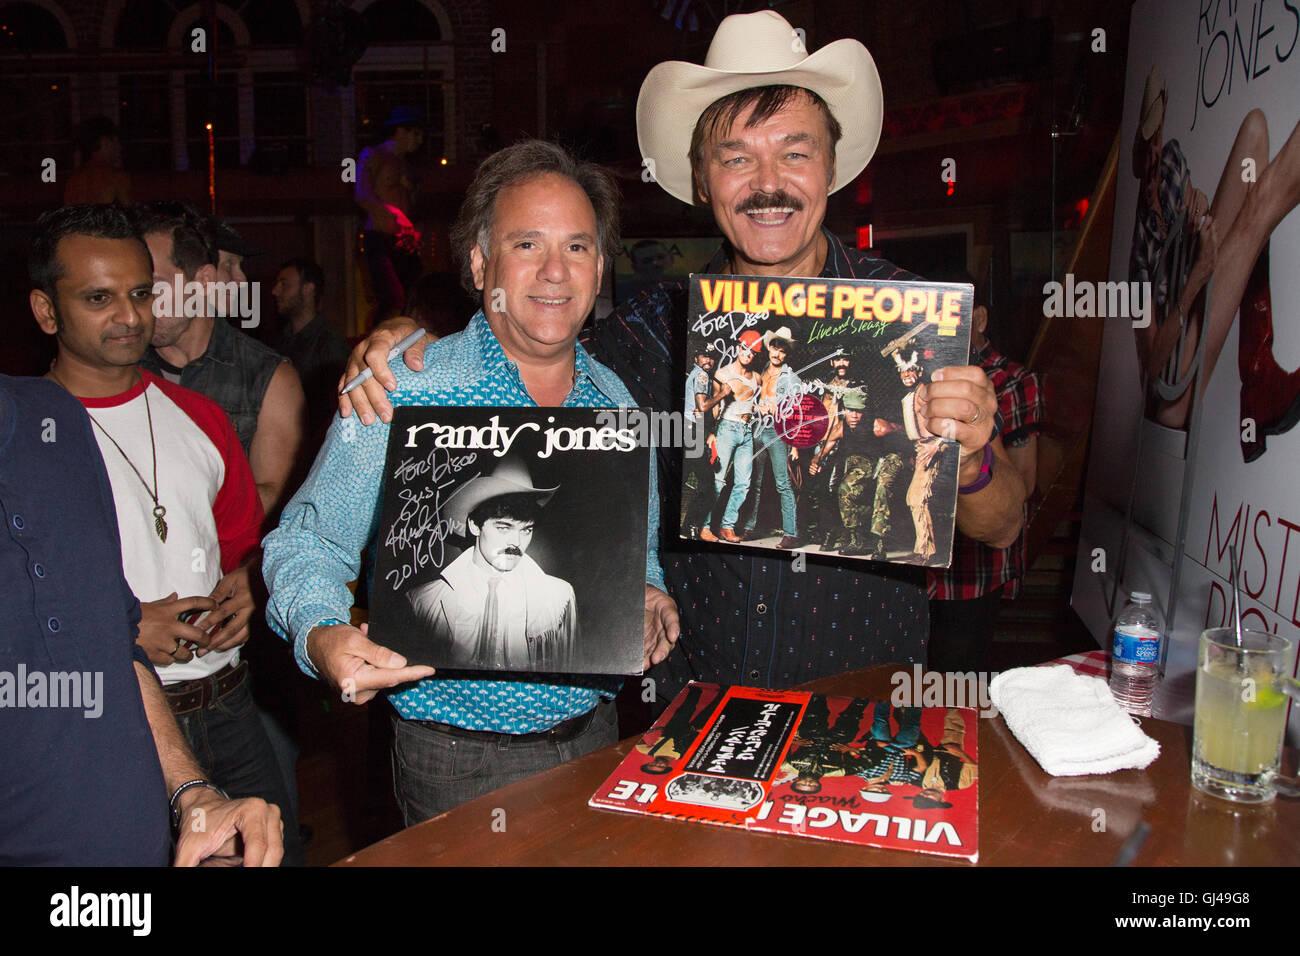 West Hollywood, California, USA. 11th August, 2016. Music artist/actor Randy Jones, original member of the Village Stock Photo